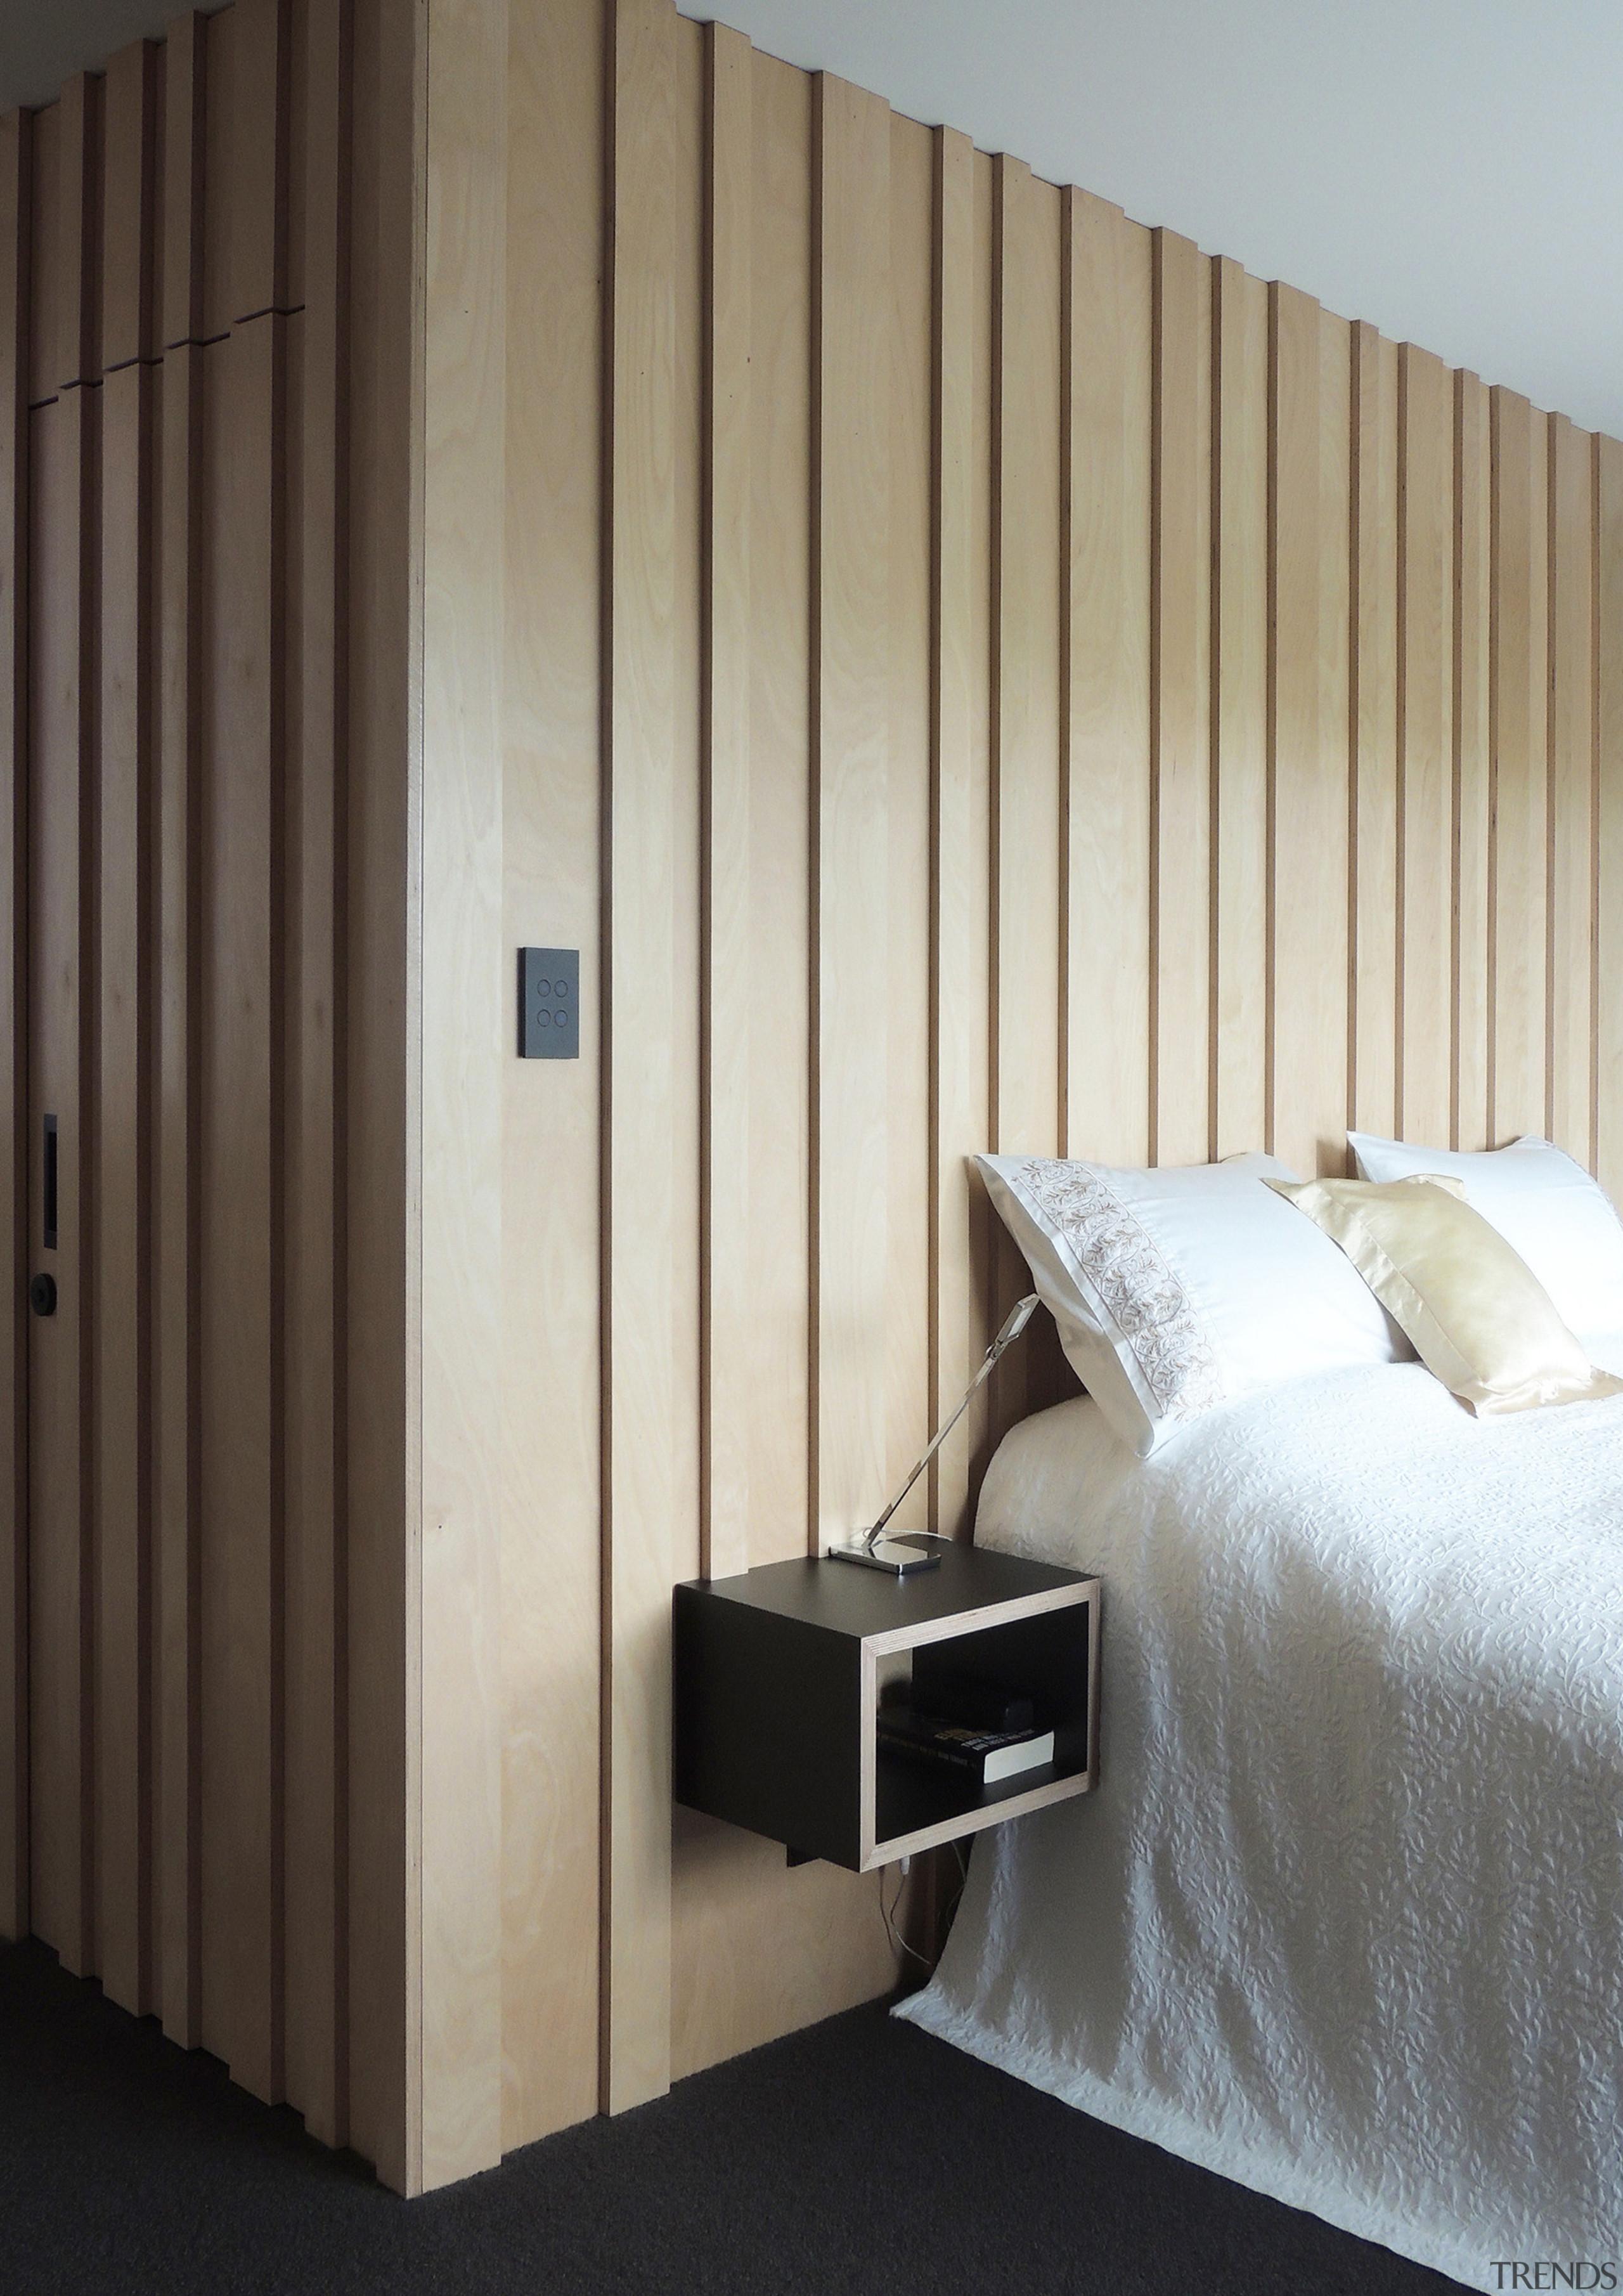 So, where's the bathroom? A birch-ply batten door furniture, wall, wardrobe, gray, black